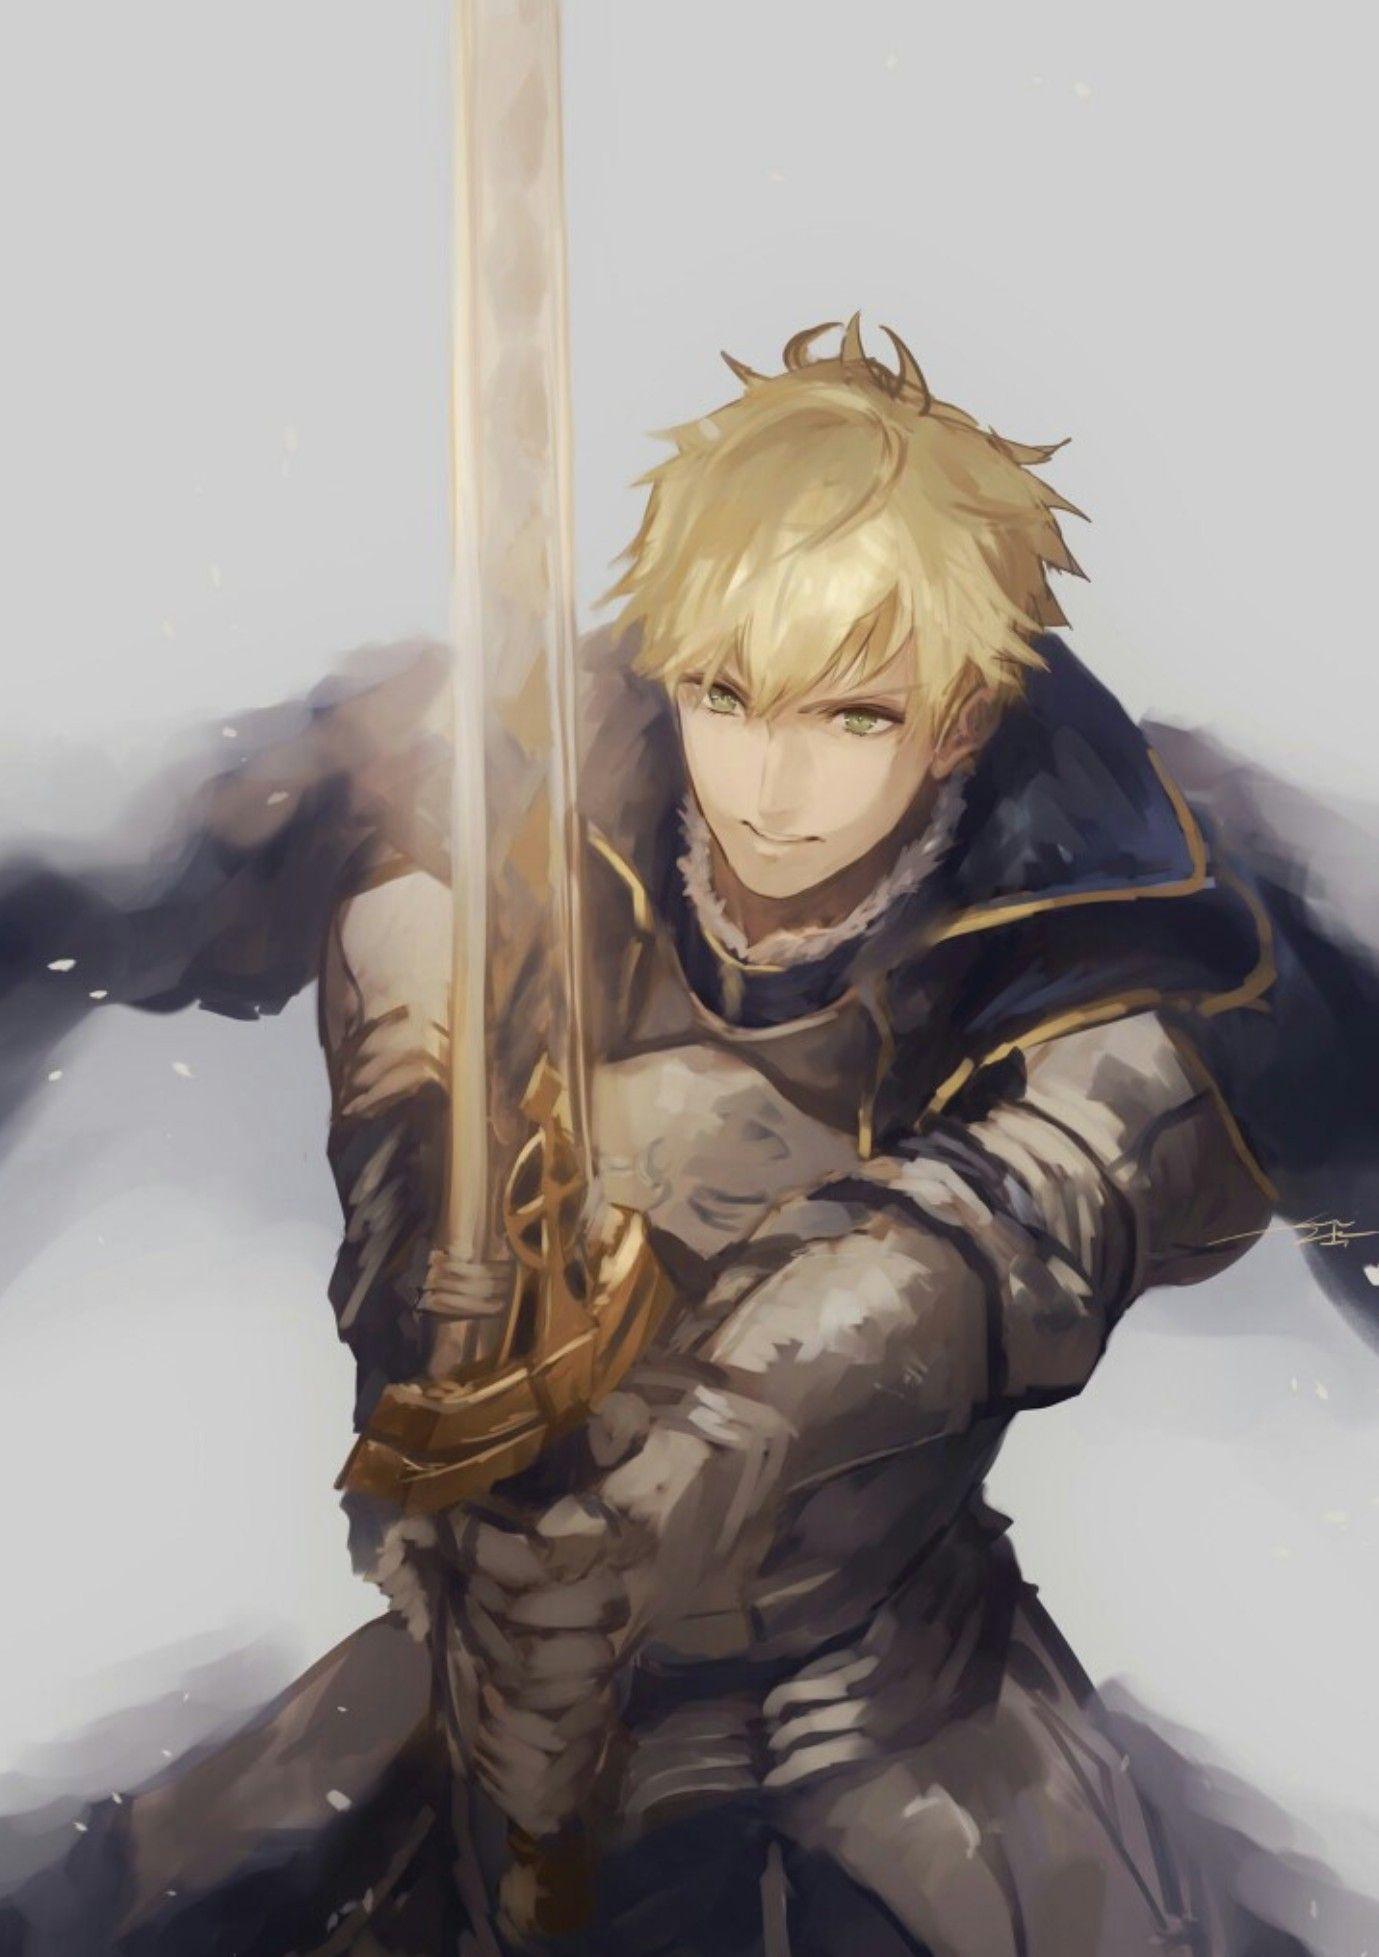 Fate/Grand Order Prototype King Arthur Fate Pinterest